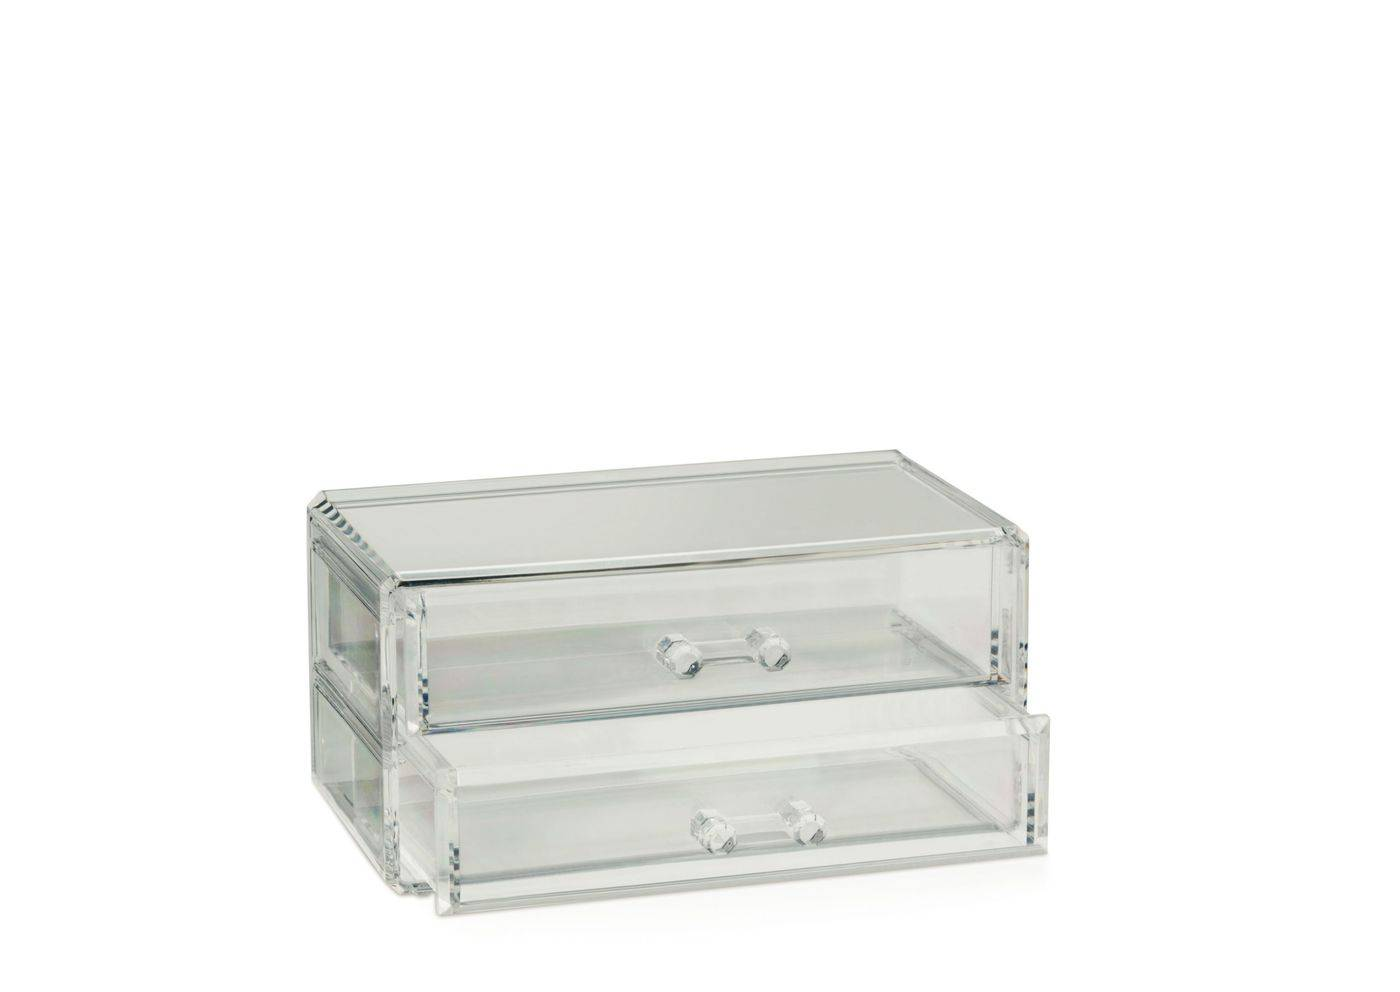 Šperkovnice SAFIRA plast, transparent, 18,5x10x9,5cm - Kela